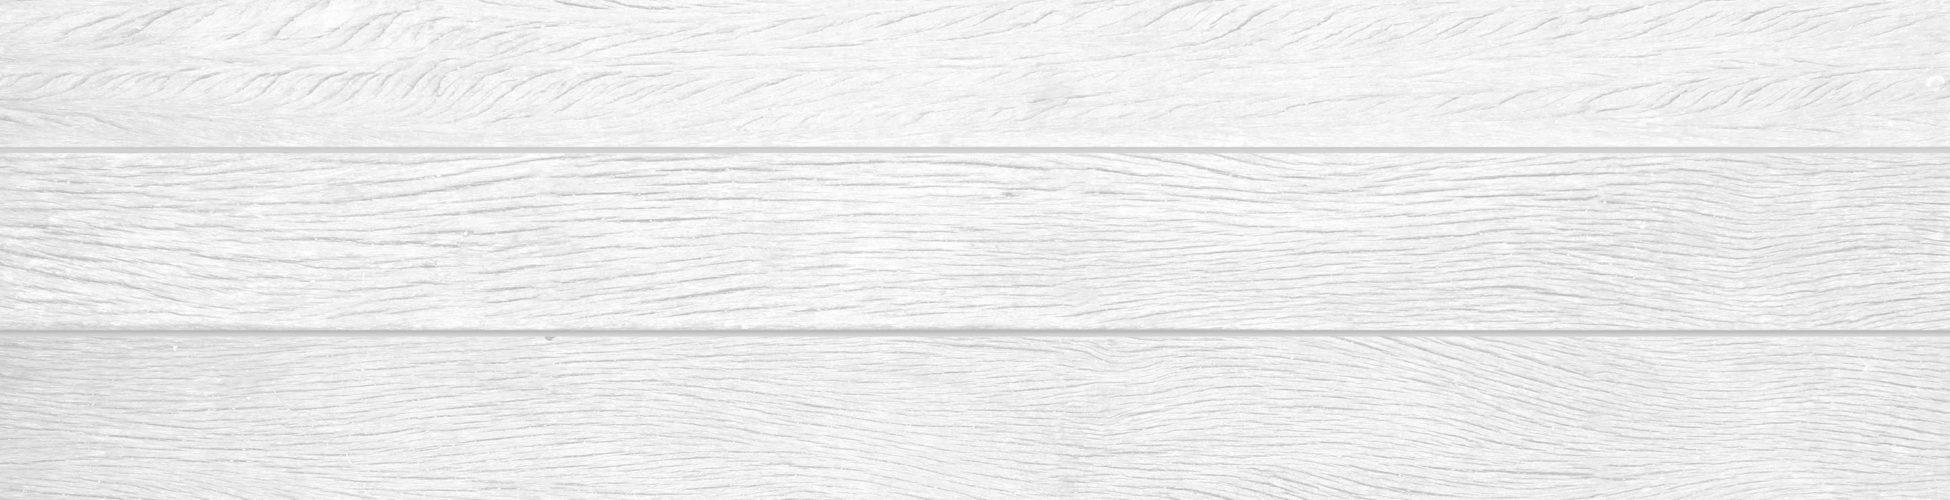 Cropped Bigstock White Wood Texture Background 50738852 Kopie